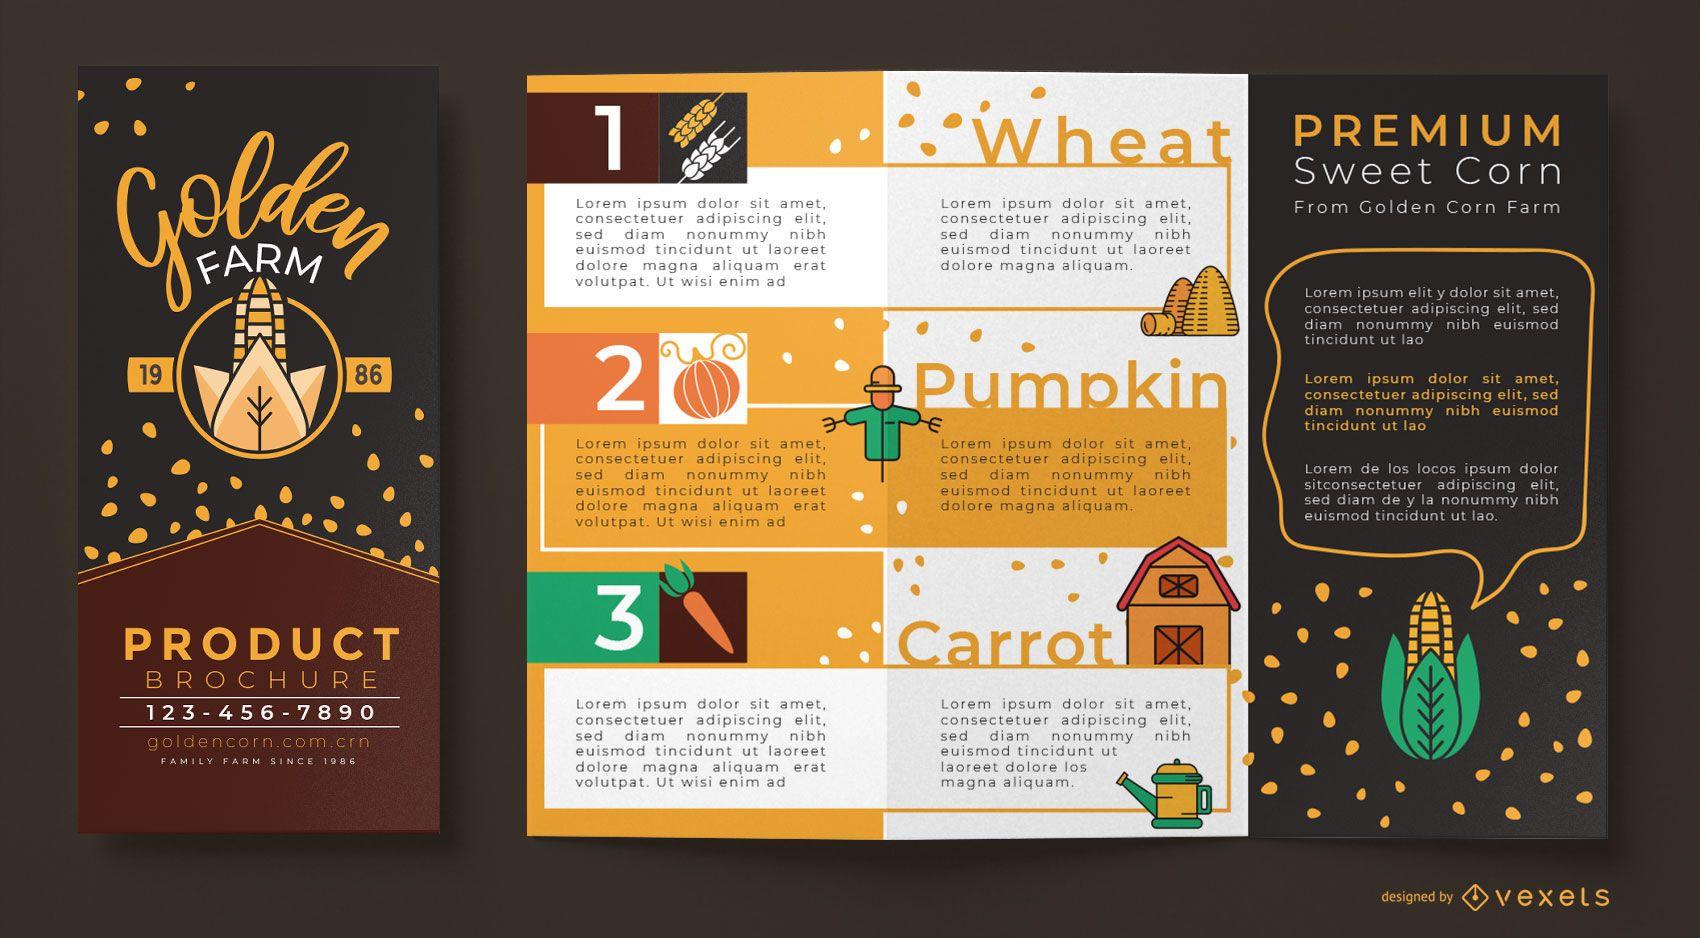 Golden corn farm brochure template